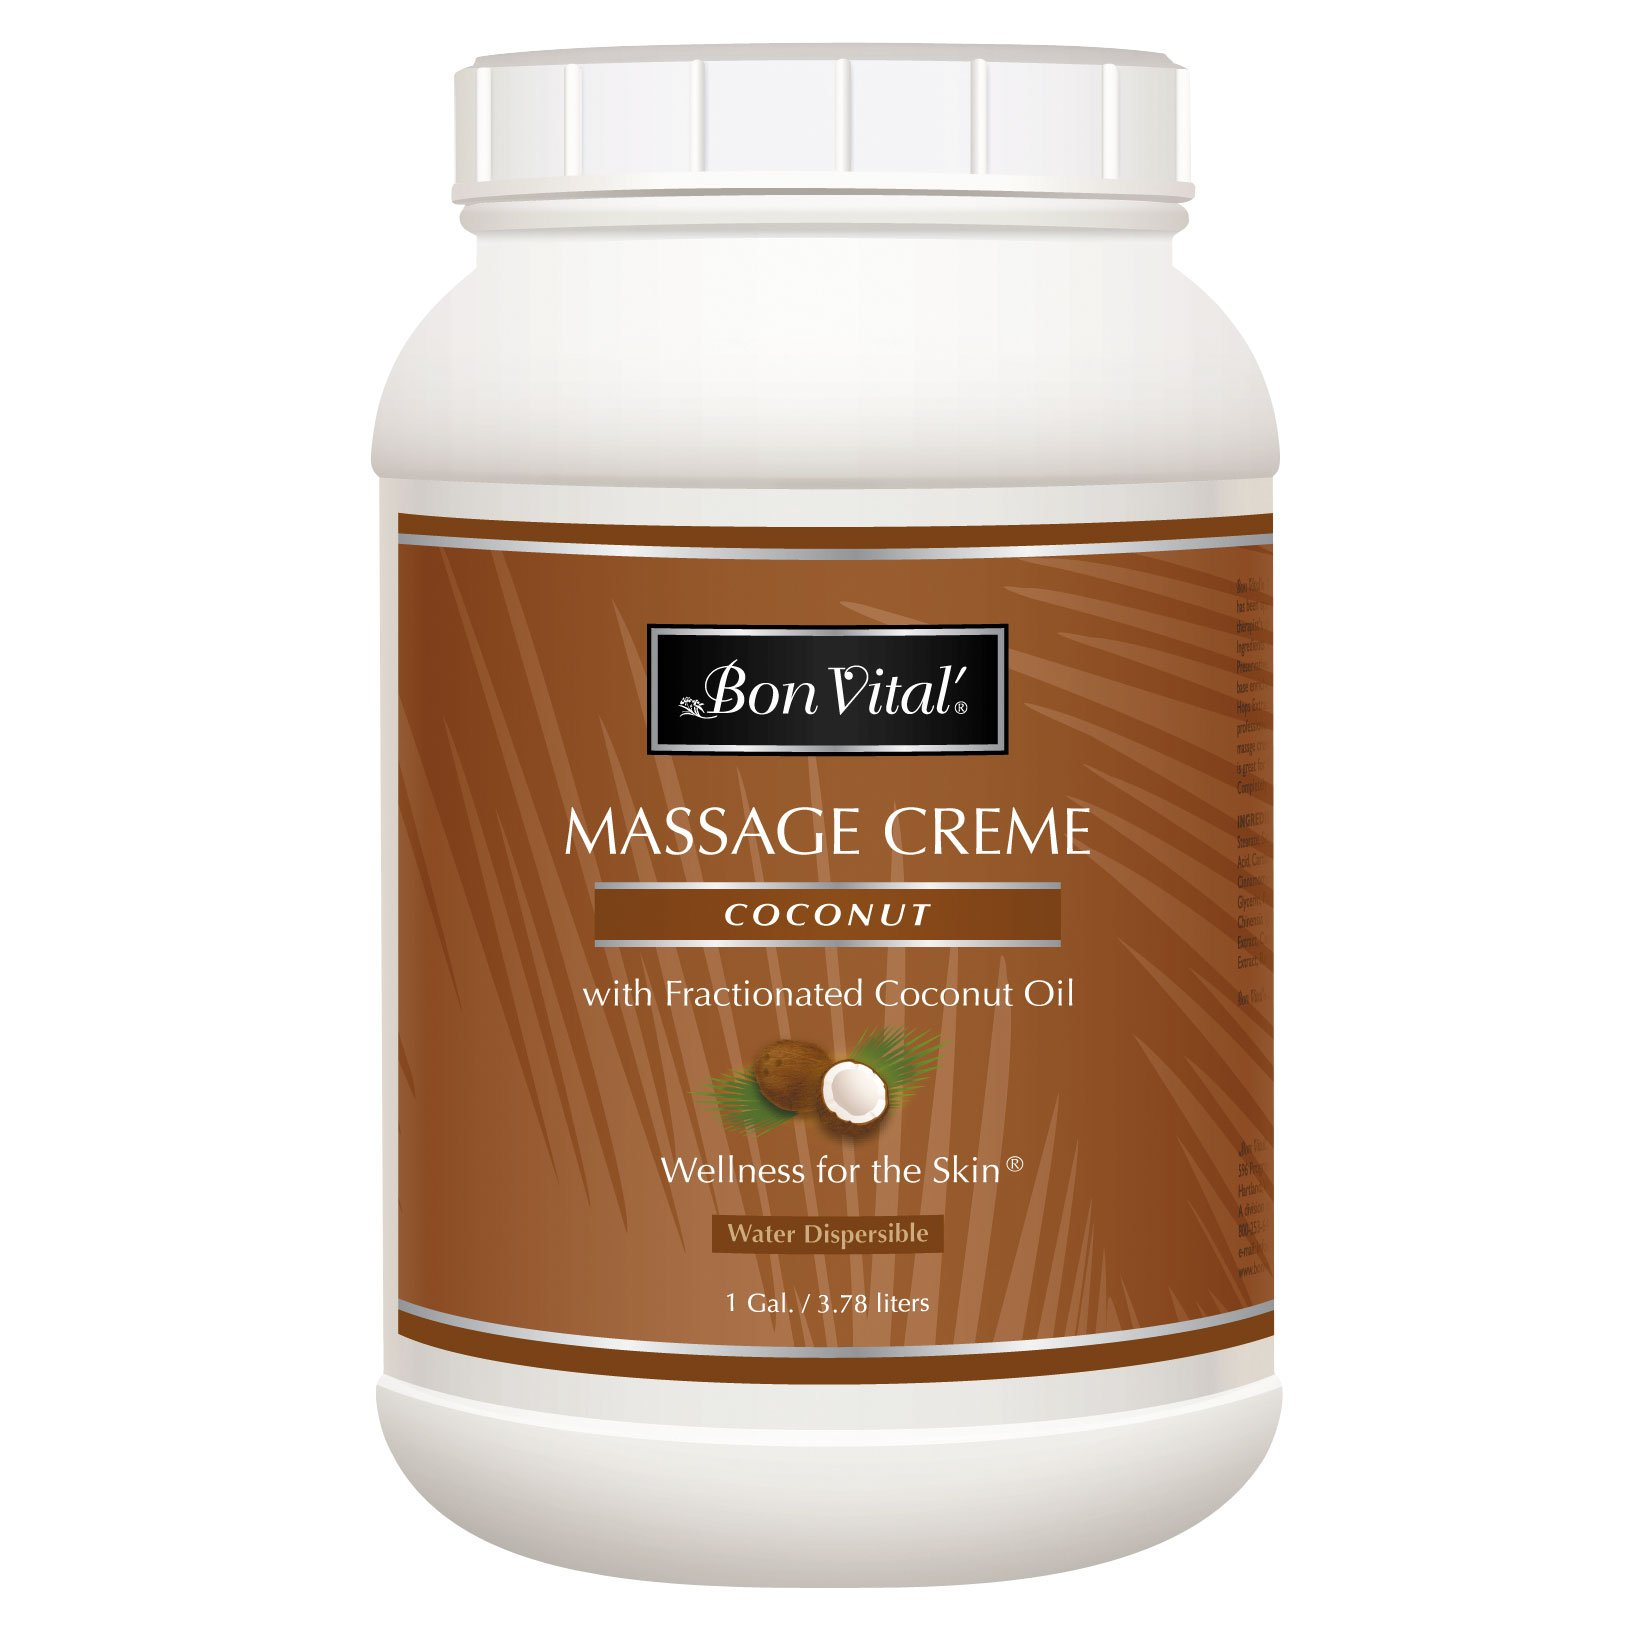 Bon Vital' Coconut Massage Crème Made with 100% Pure Fractionated Coconut Oil, Massage Cream & Moisturizer to Repair Dry Skin, No Greasy Feel, Anti-Aging Cream for Professional Massage, 1 Gallon Jar